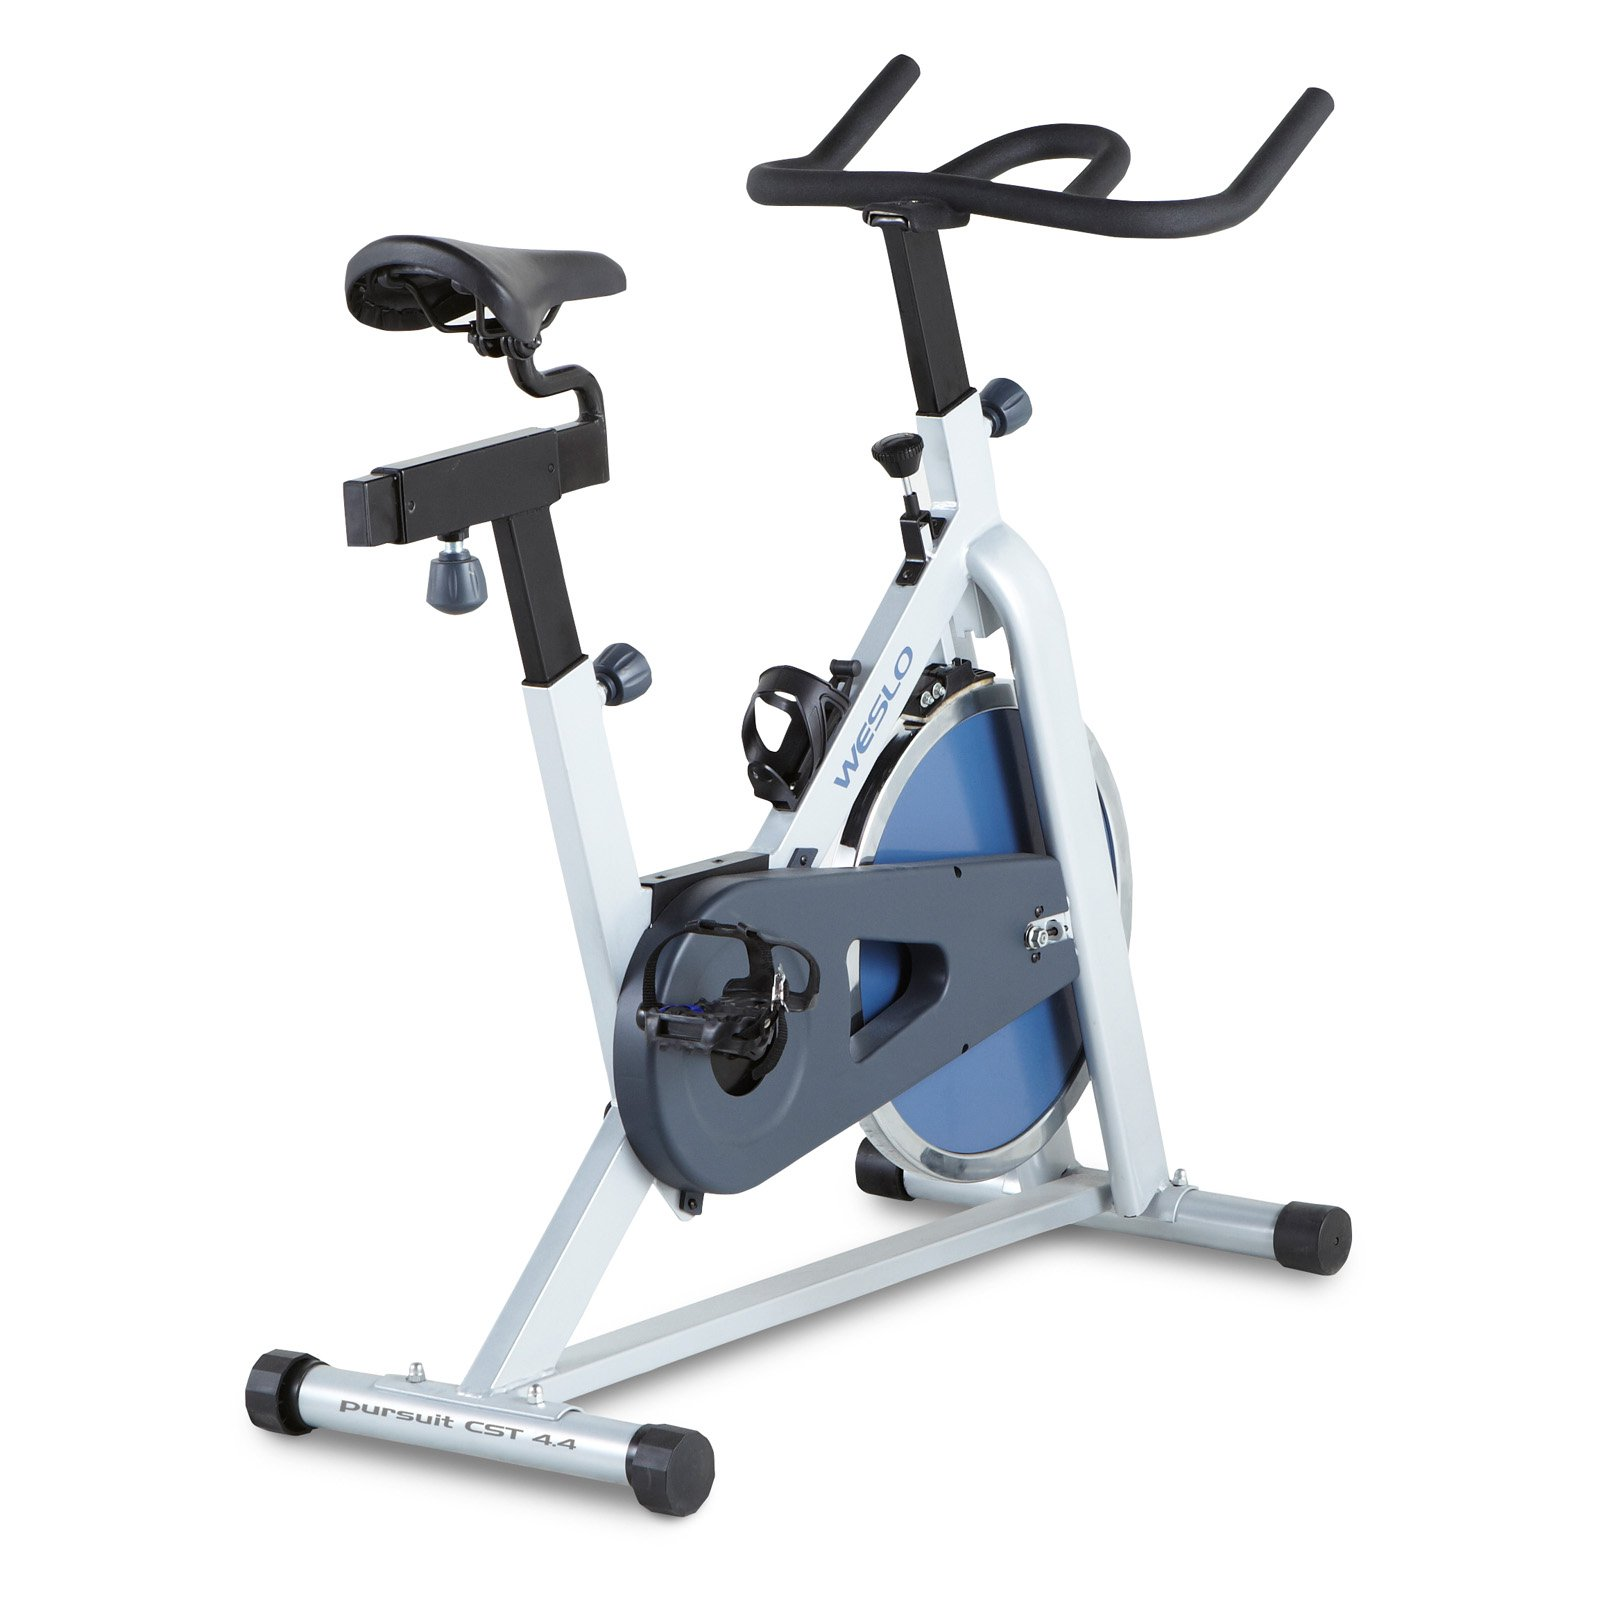 Weslo Pursuit CST 4.4 Spinning Bike